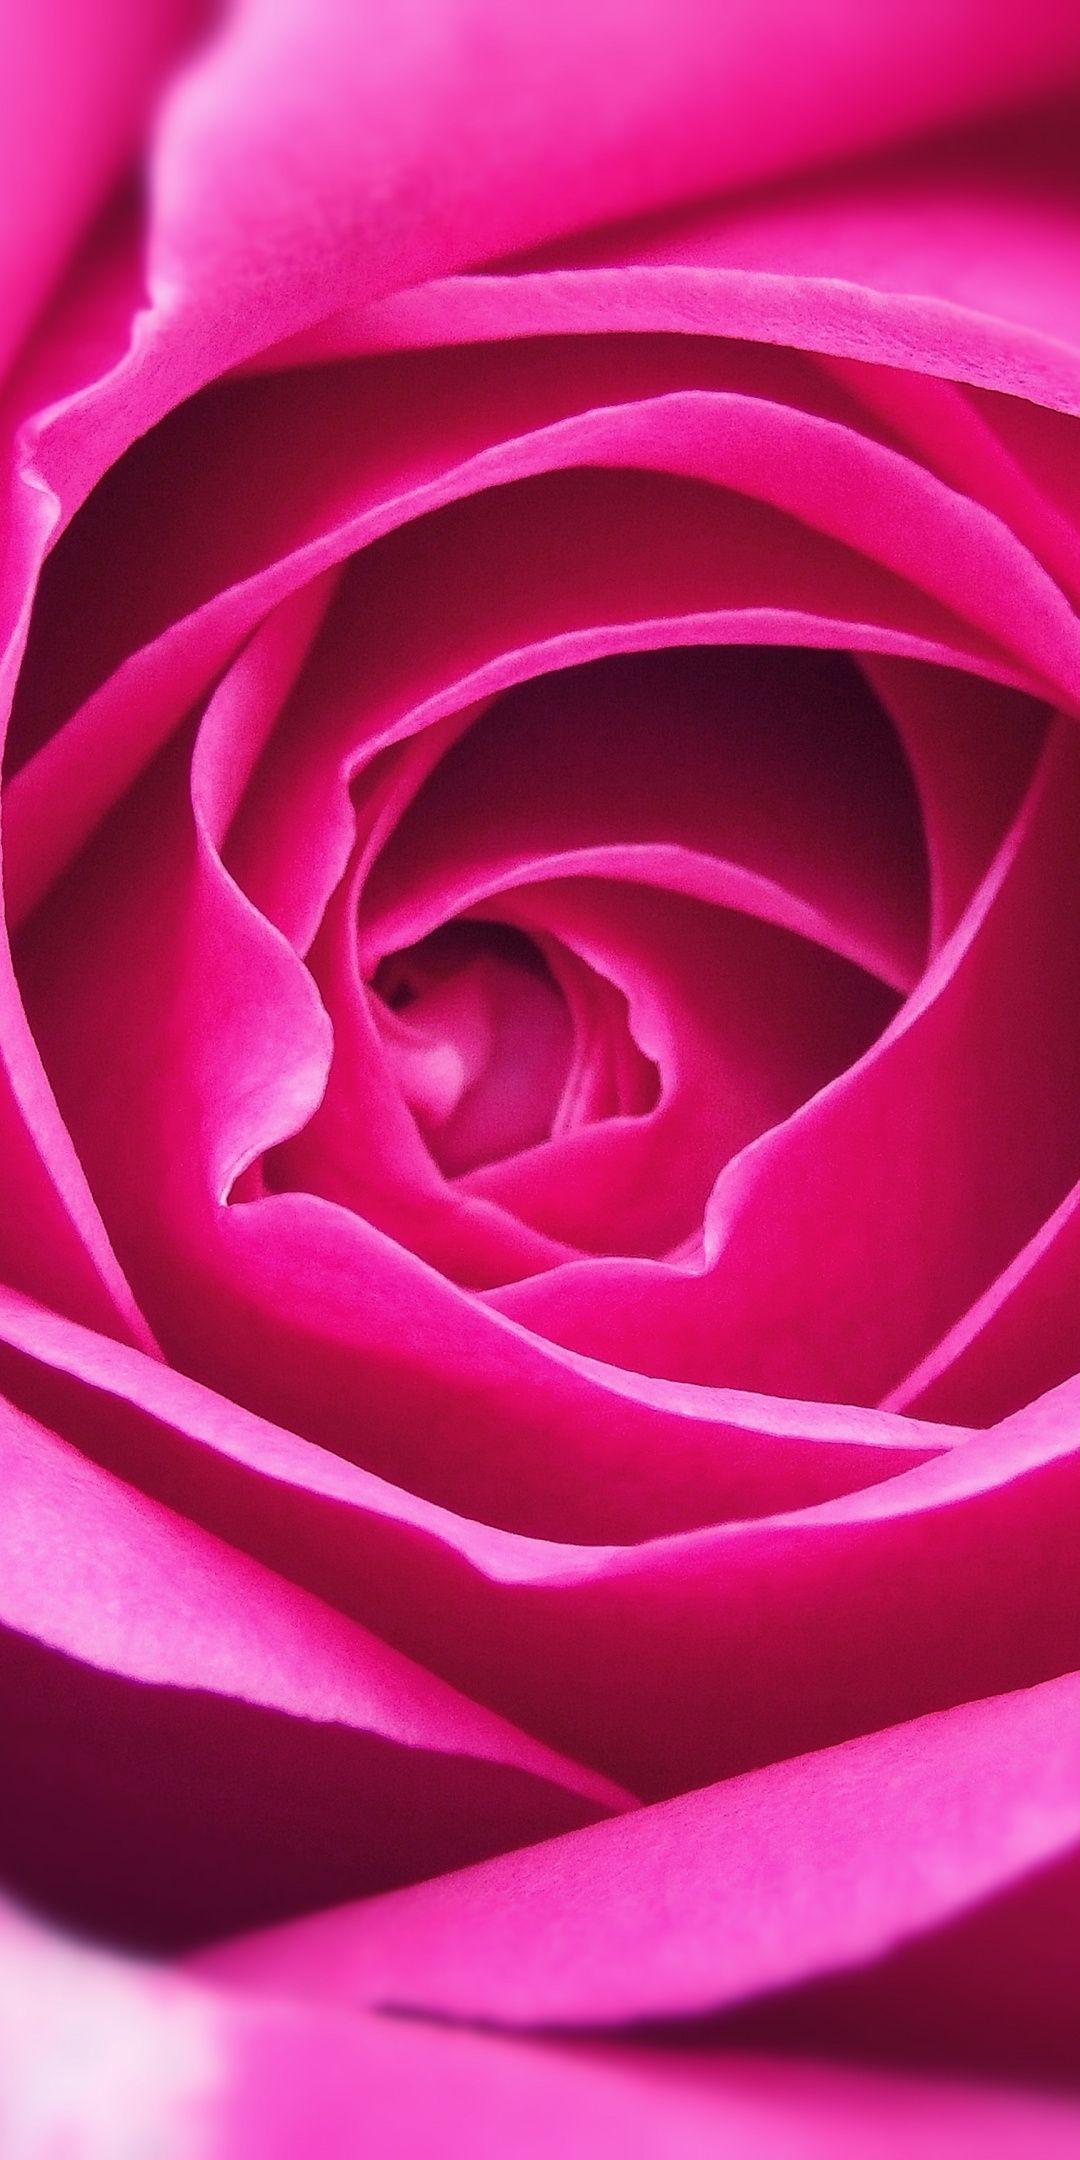 Close Up Petal Pink Rose 1080x2160 Wallpaper Rose Flower Wallpaper Beautiful Rose Flowers Rose Wallpaper Wallpaper rose flower close up petals